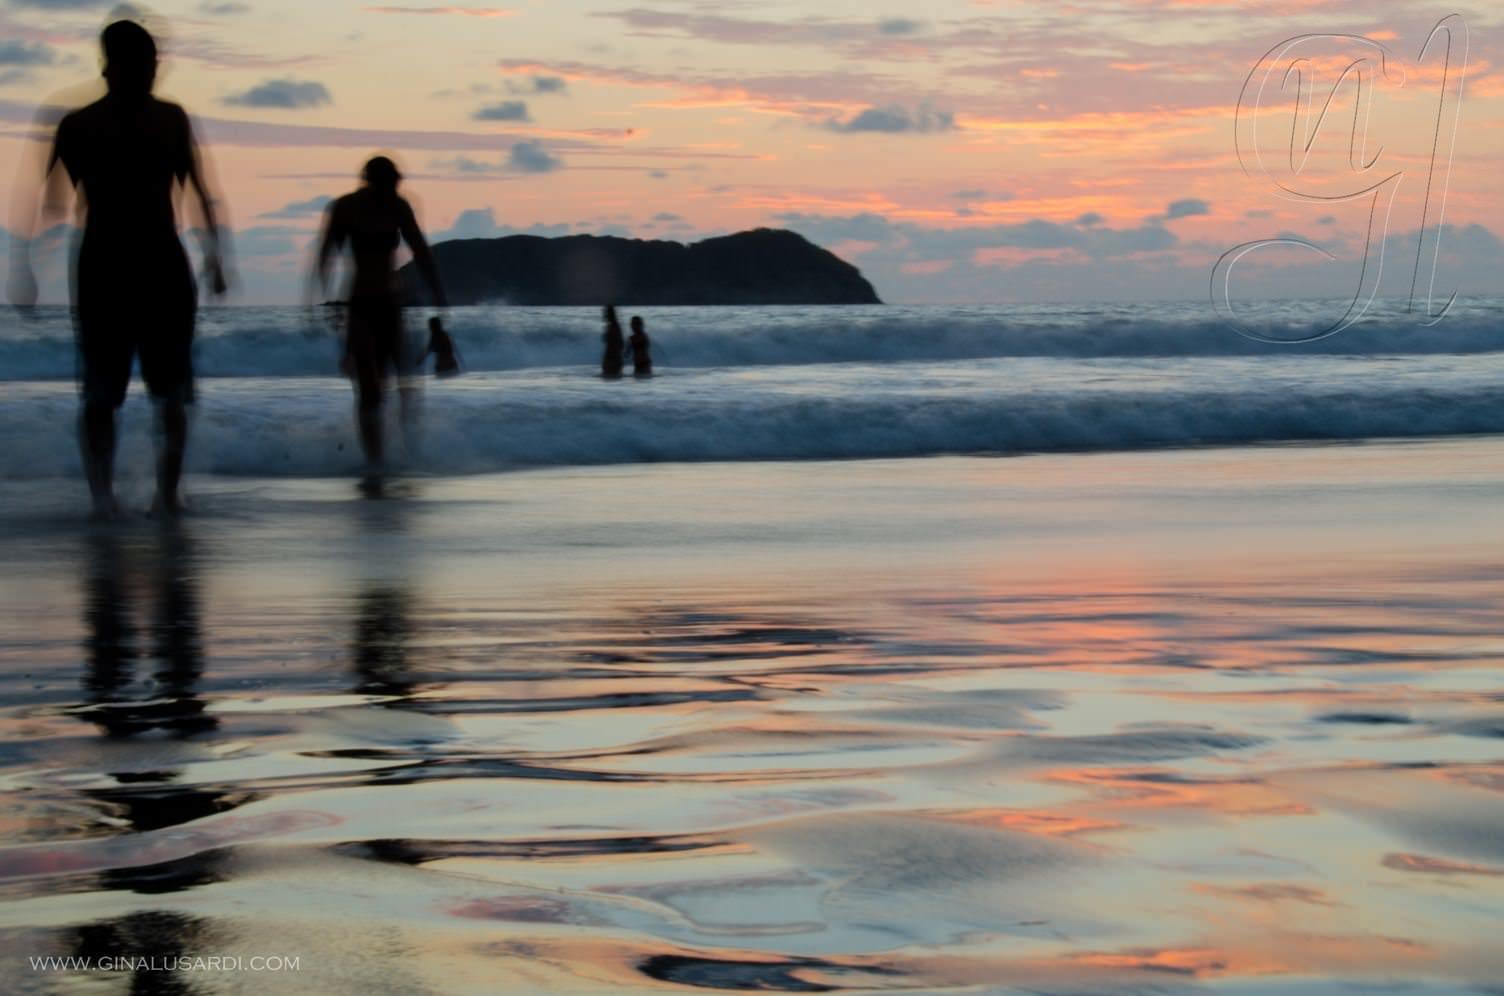 Two-Monkeys-Travel-Costa-Rica-Scuba Diving in costa rica